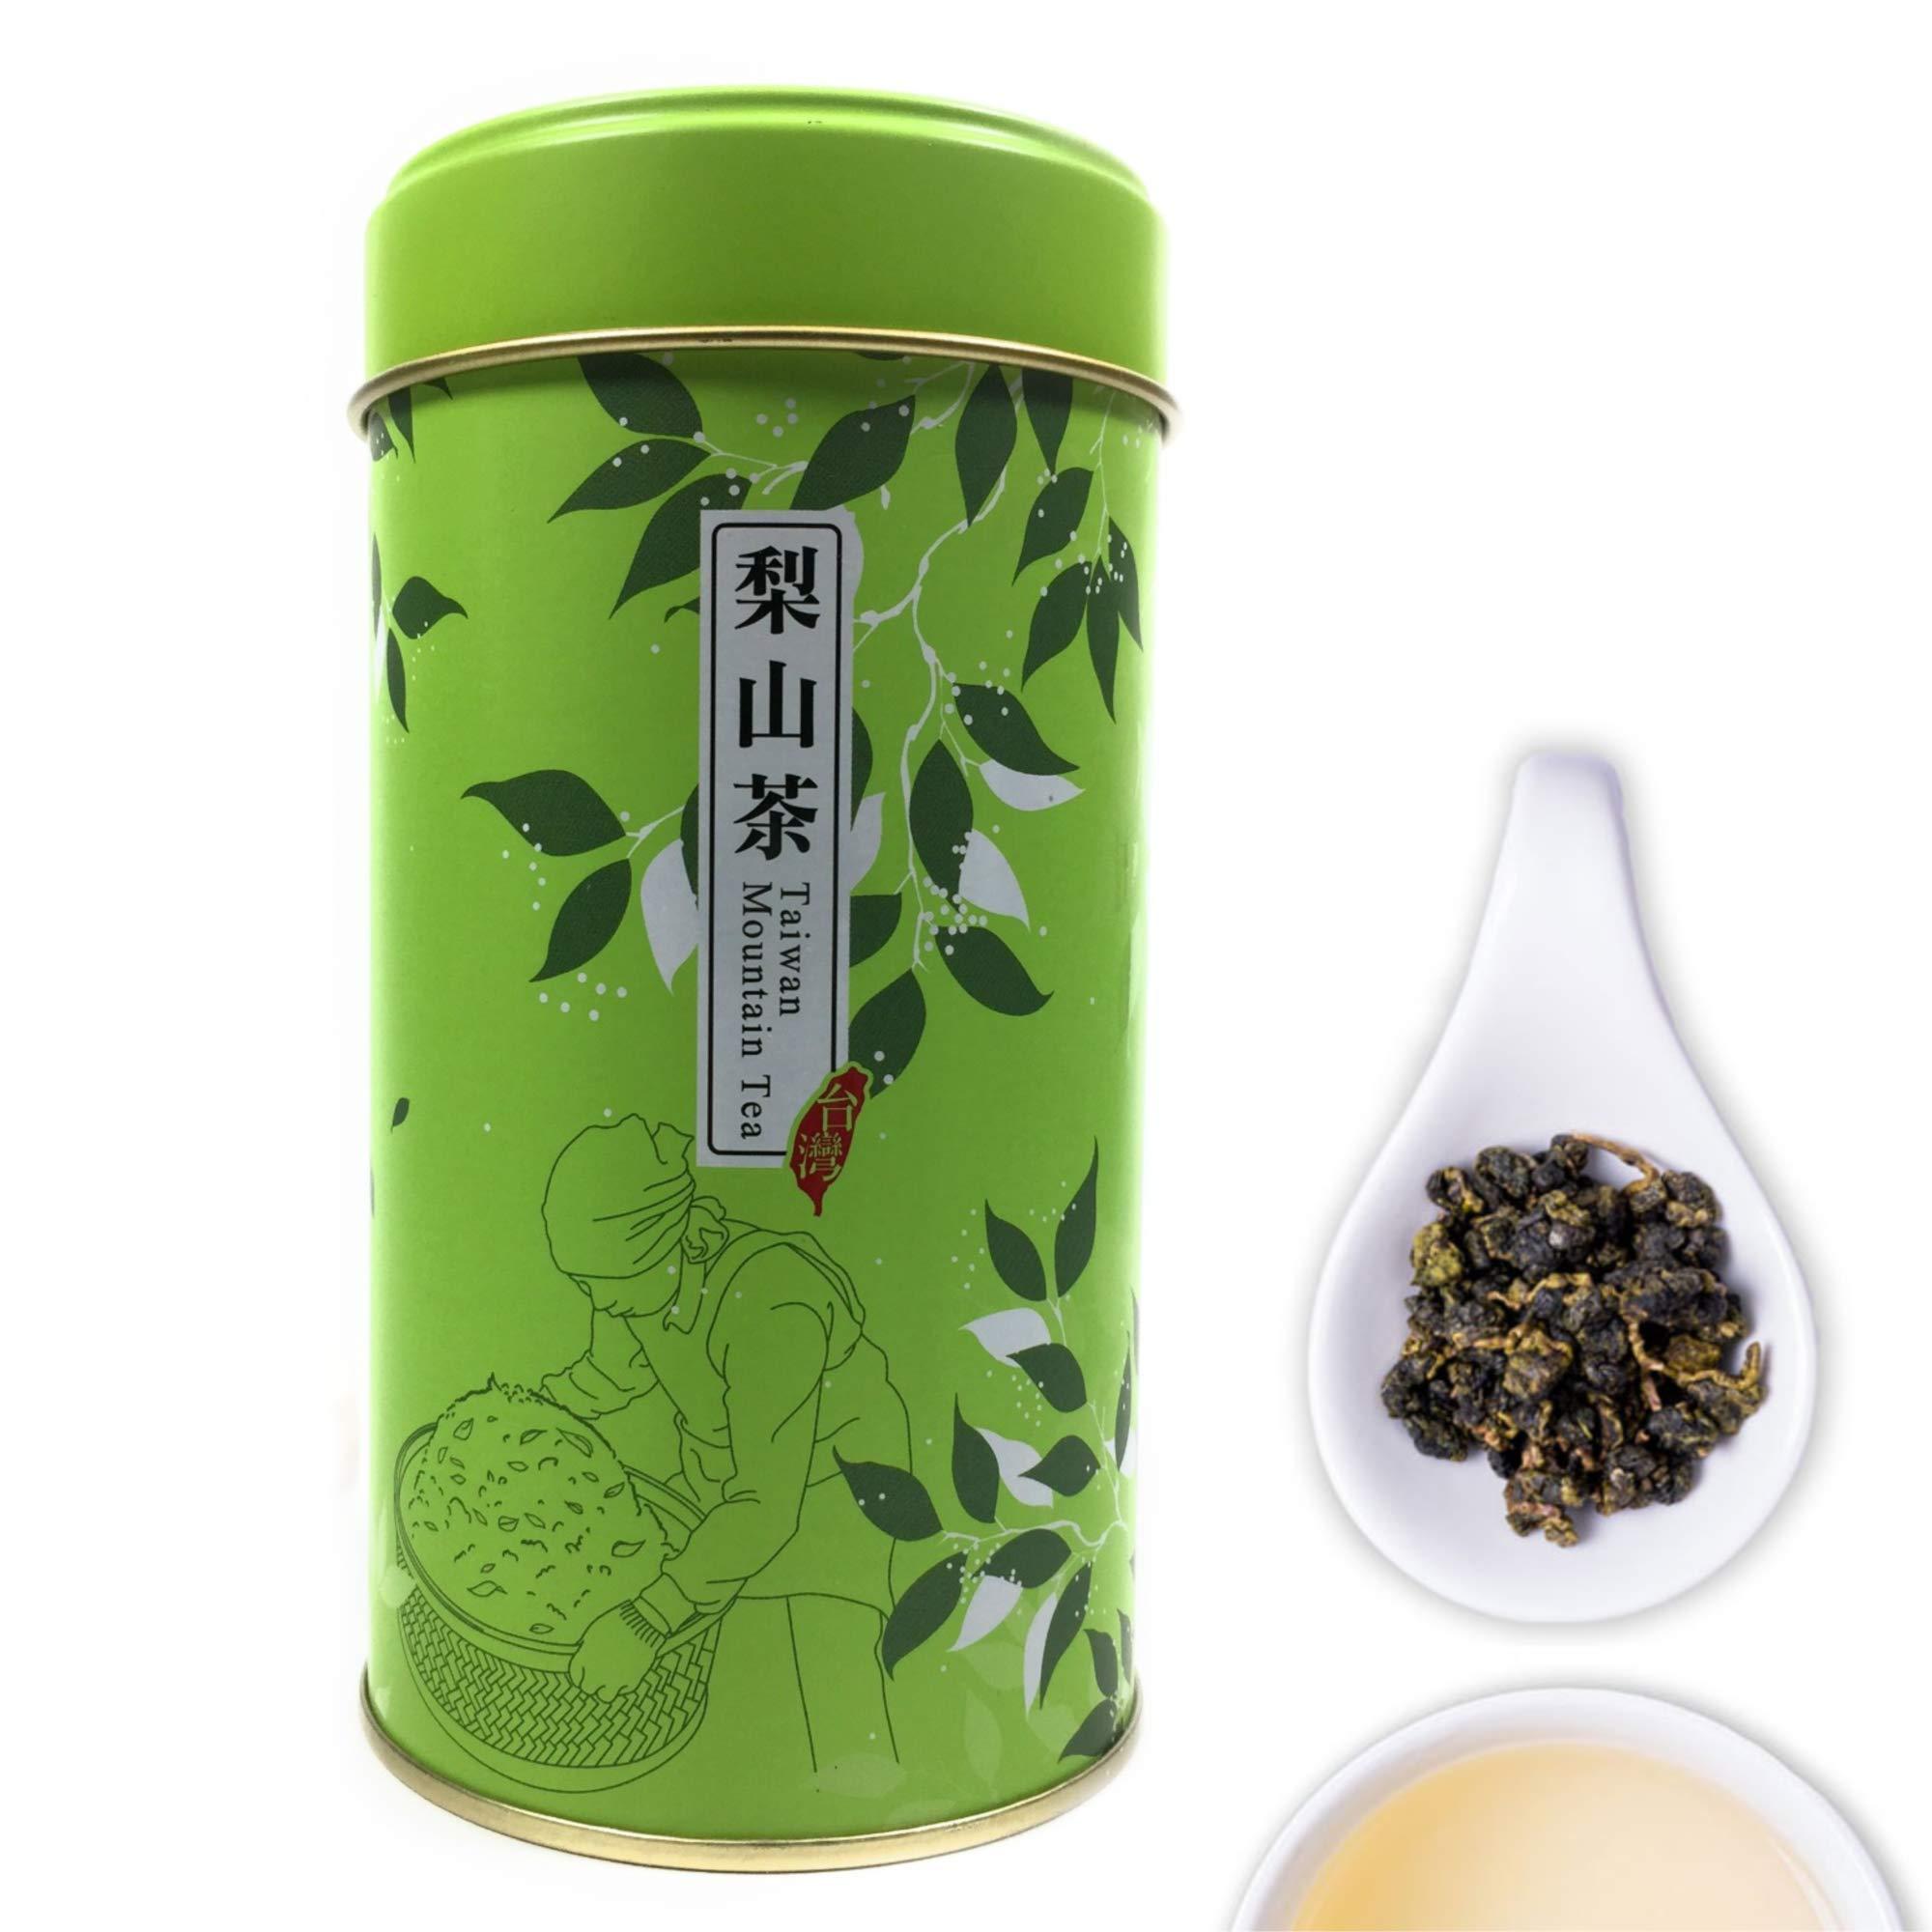 Tepacito Oolong Tea Loose Leaf Taiwan High Mountain Lishan Tea Naturally Grown Fresh Flavor Delicious Health Attributes Unique Aroma Weight Loss